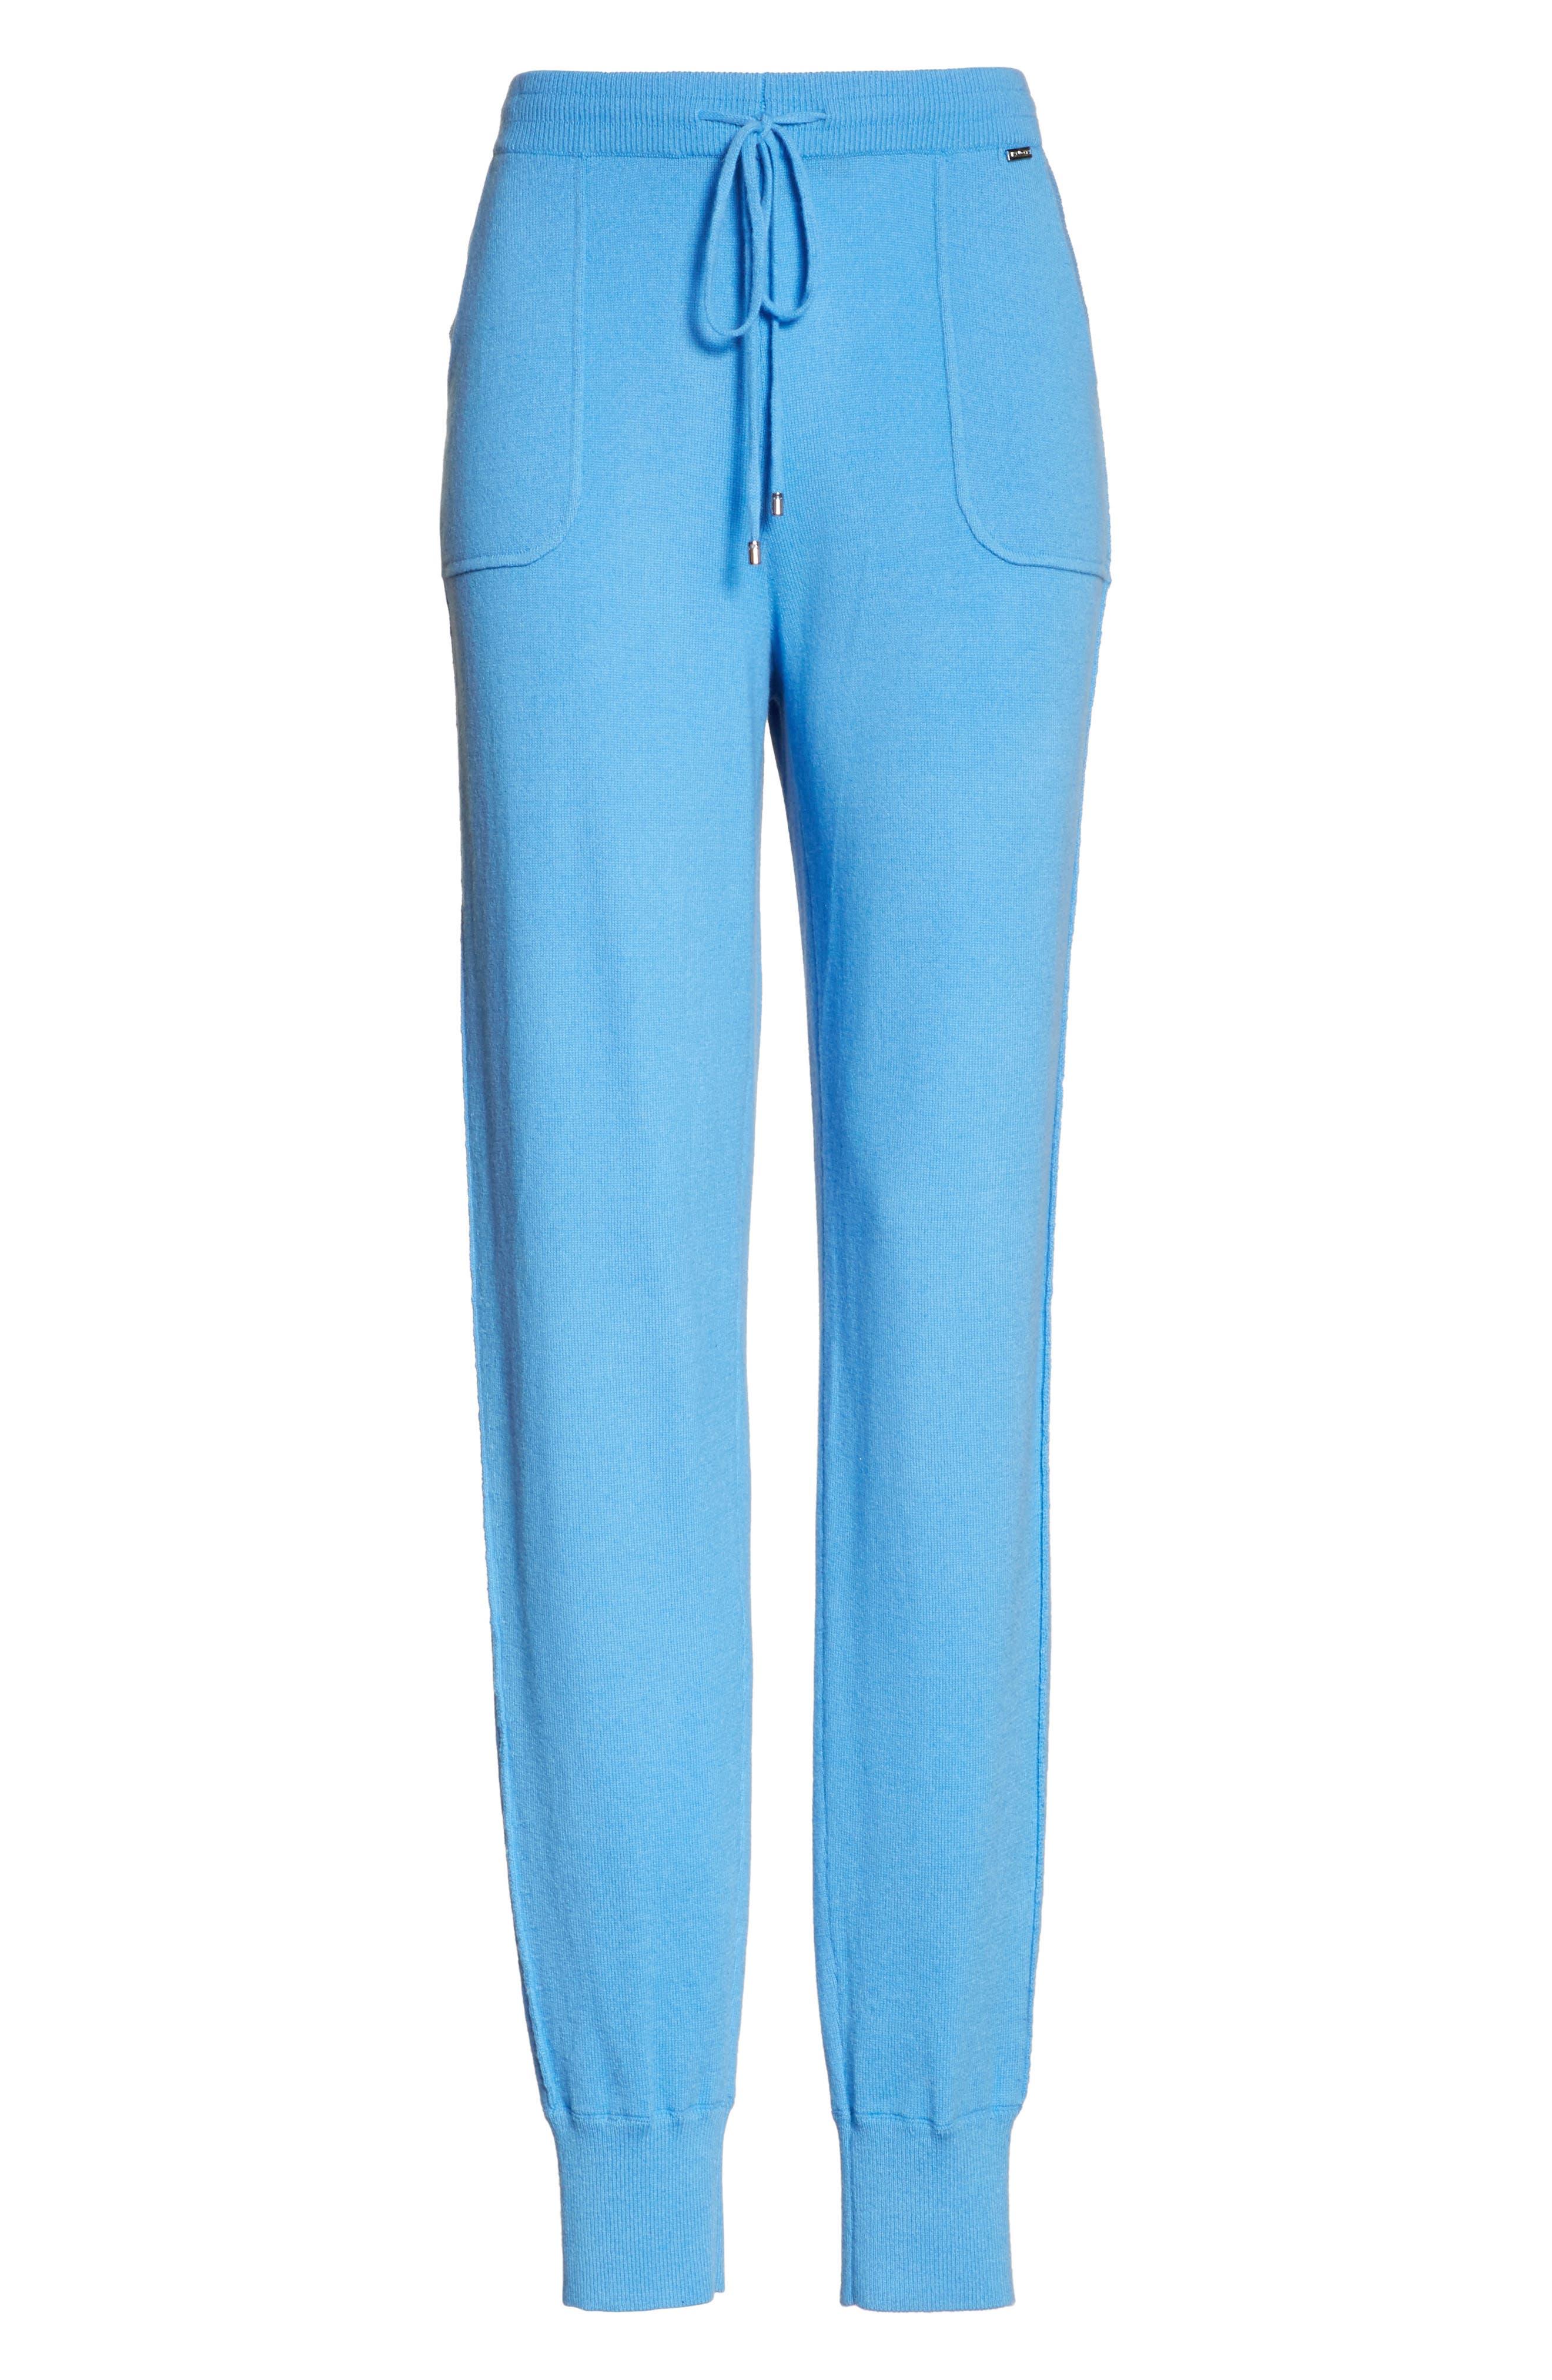 Cashmere Jersey Pants,                             Alternate thumbnail 6, color,                             Bright Niagara